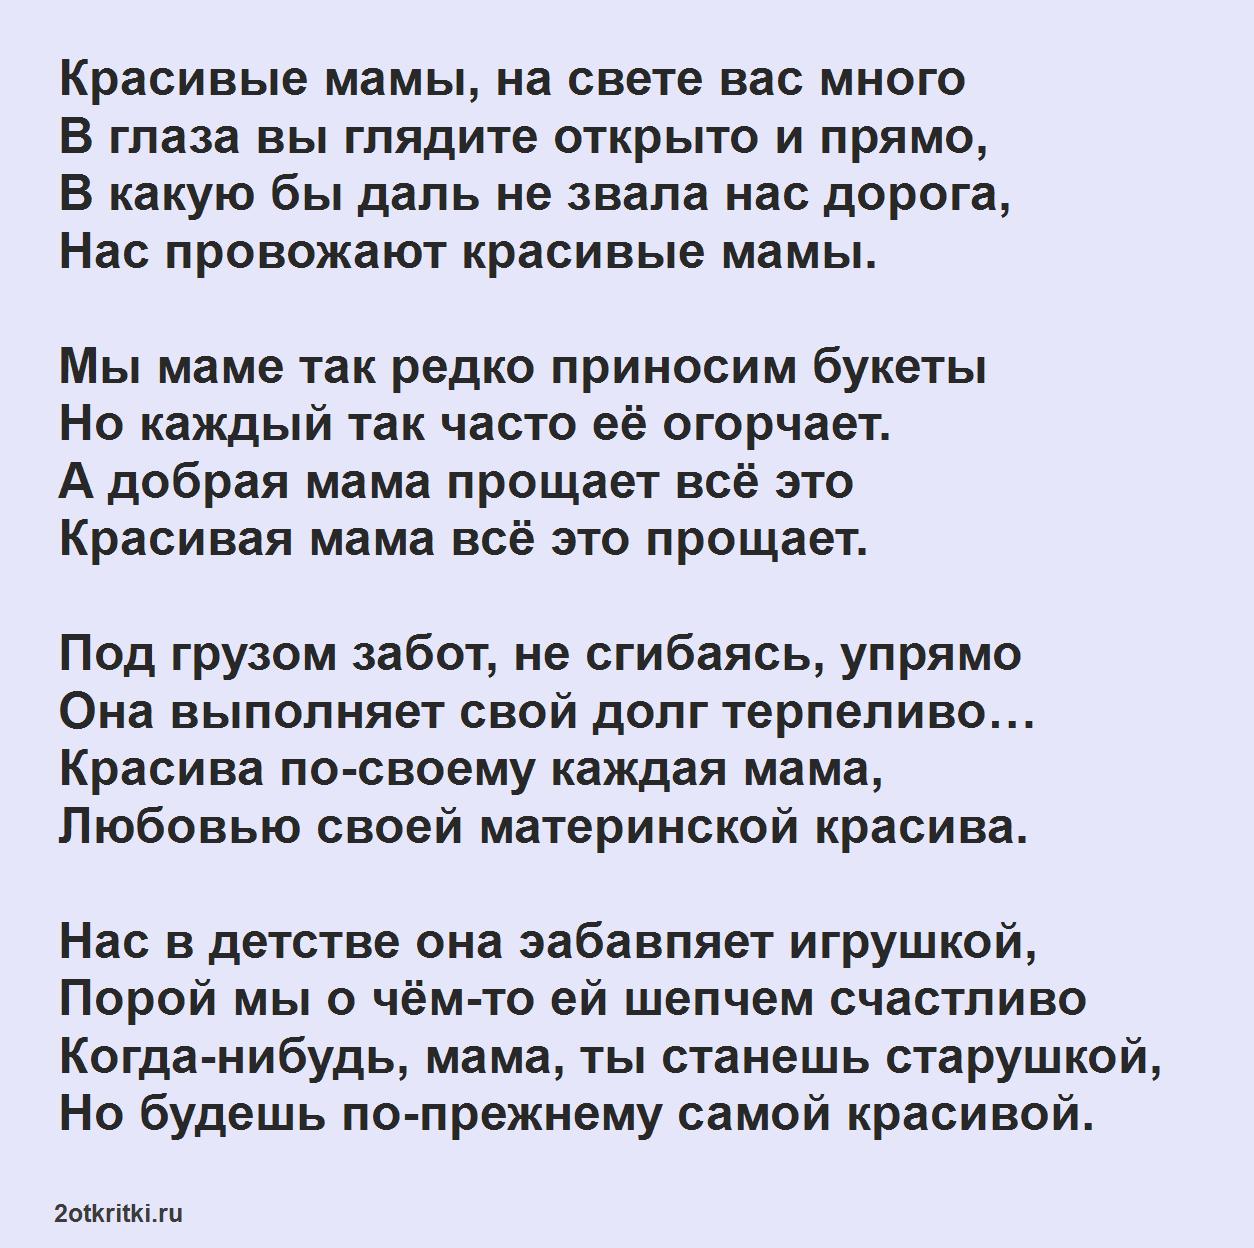 Стихи про маму - Богомазов, Красивая мама